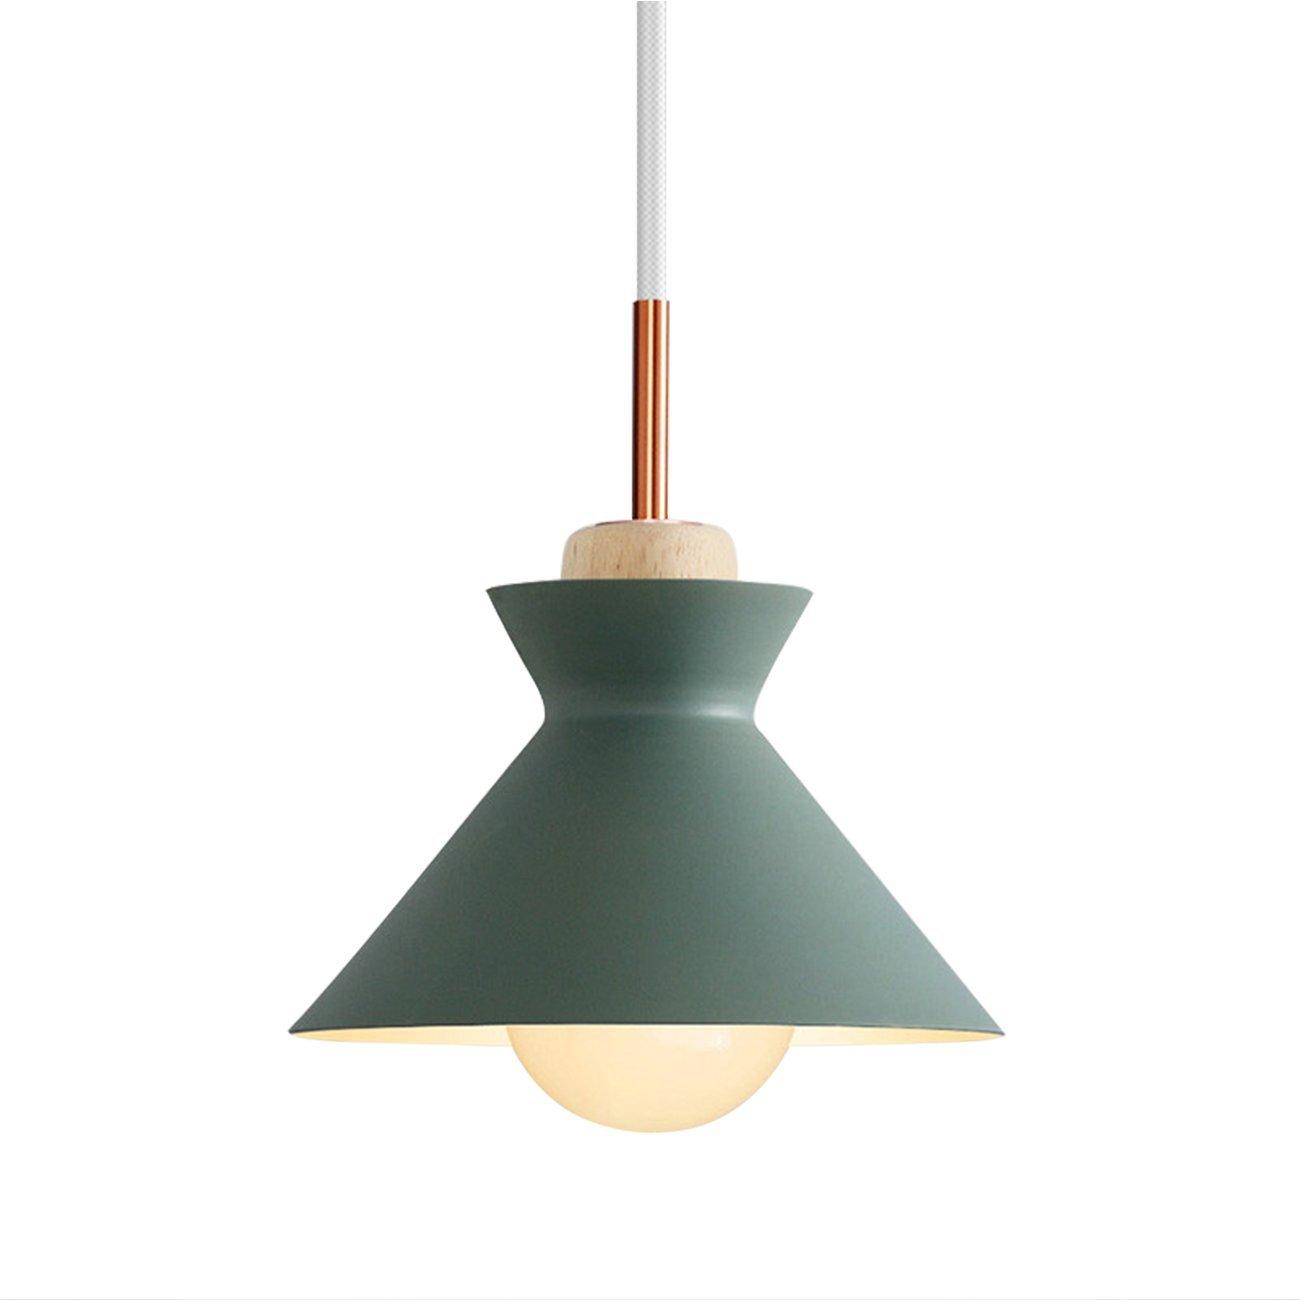 Nordic Modern Pendant Light - $48.60